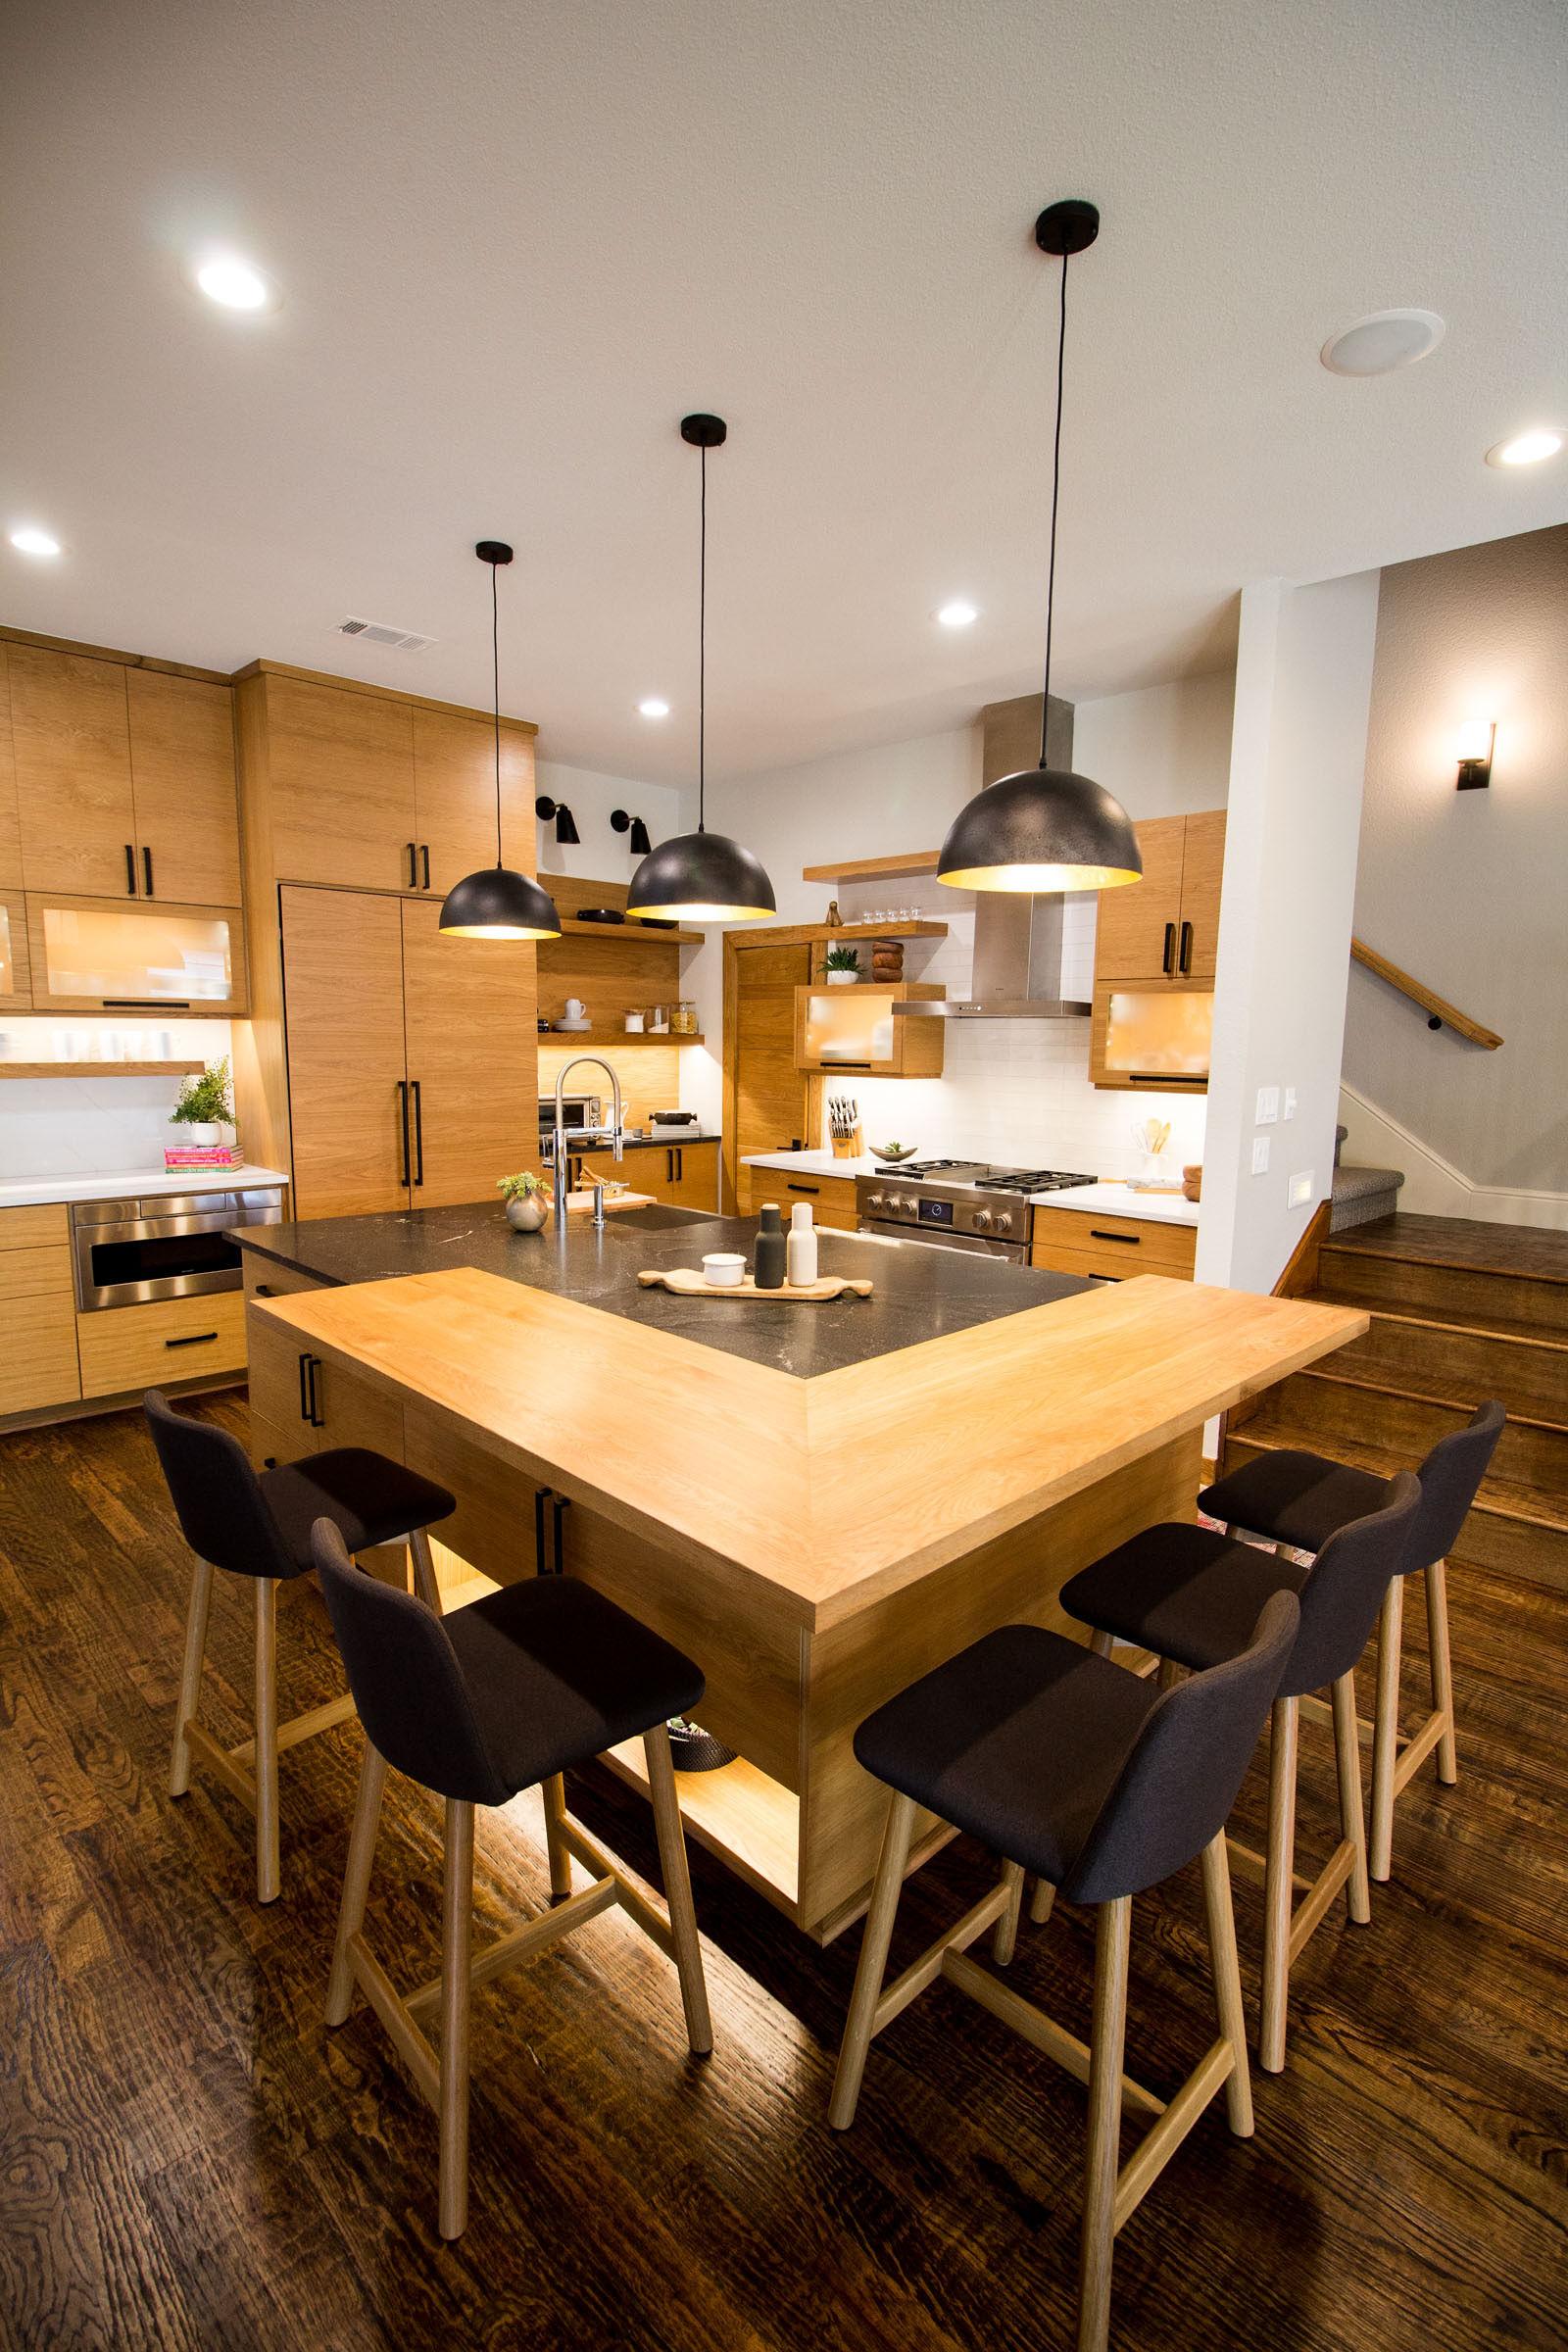 Warm tones, industrial vibe, simple, open floor plan, raw wood, blonde cabinets, hard wood floors, under lighting